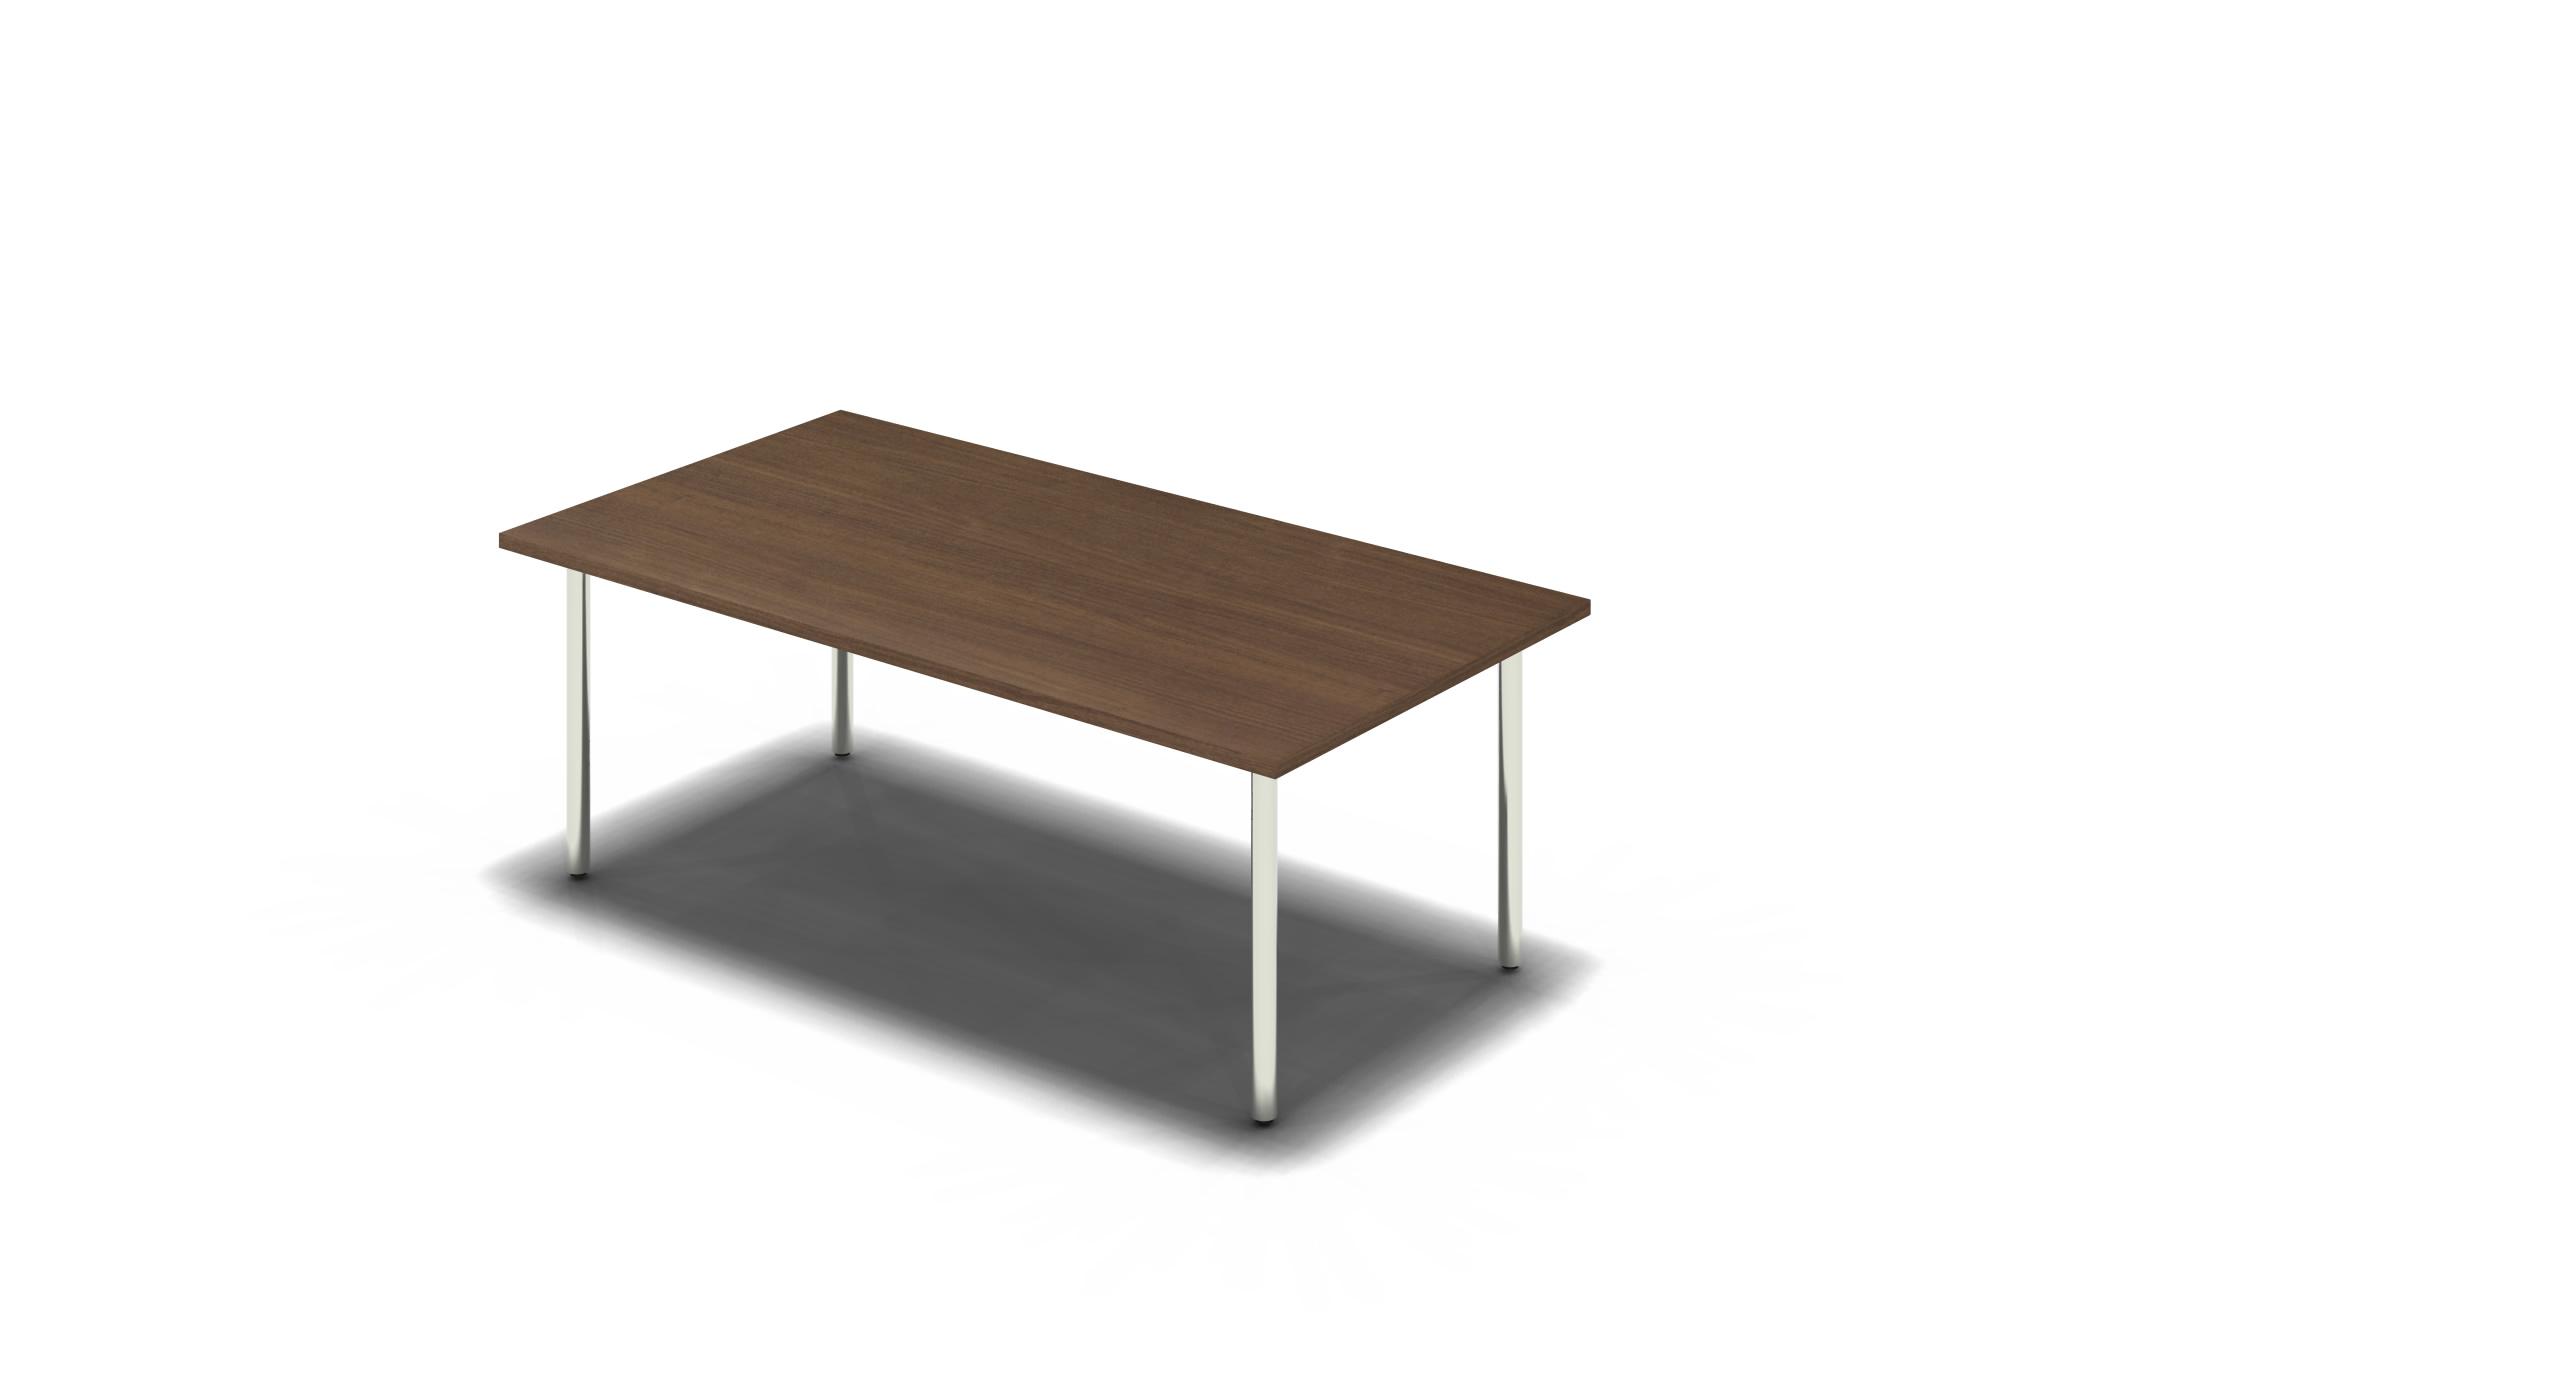 Table_Round_1800x900_Chrome_Walnut_noOption